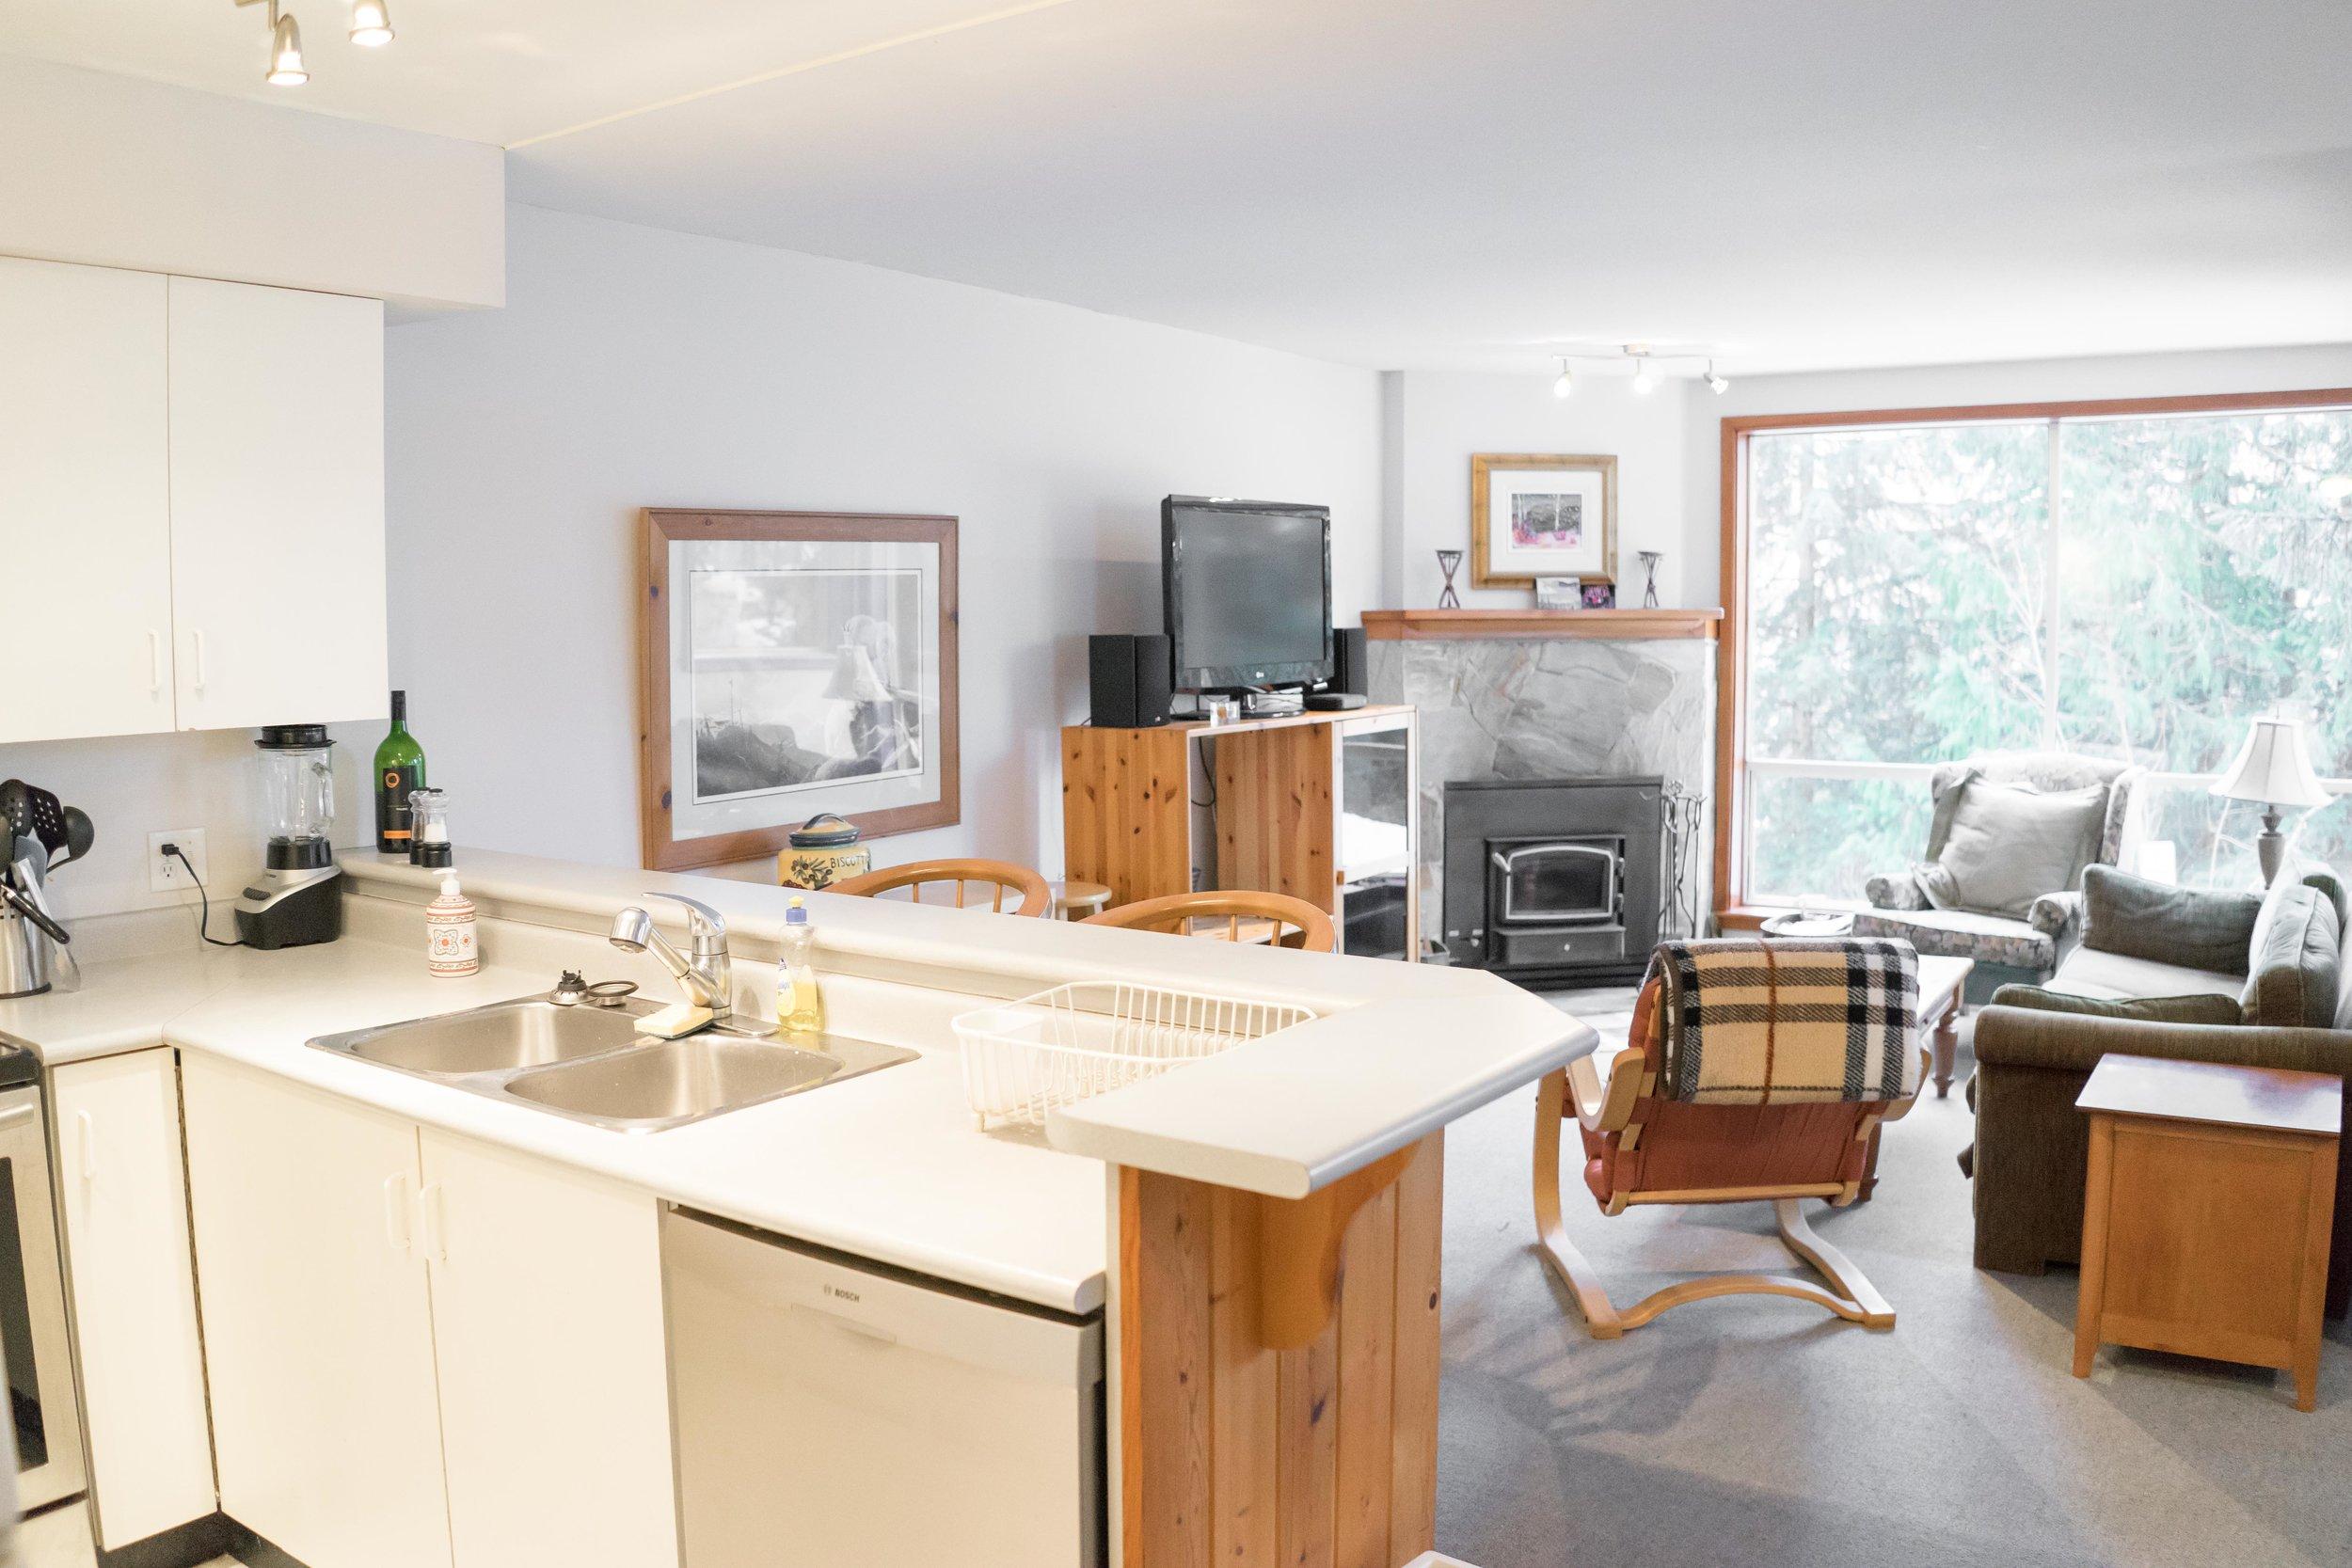 Ride On Whistler - Franz's Chalet - Kitchen/Living Room